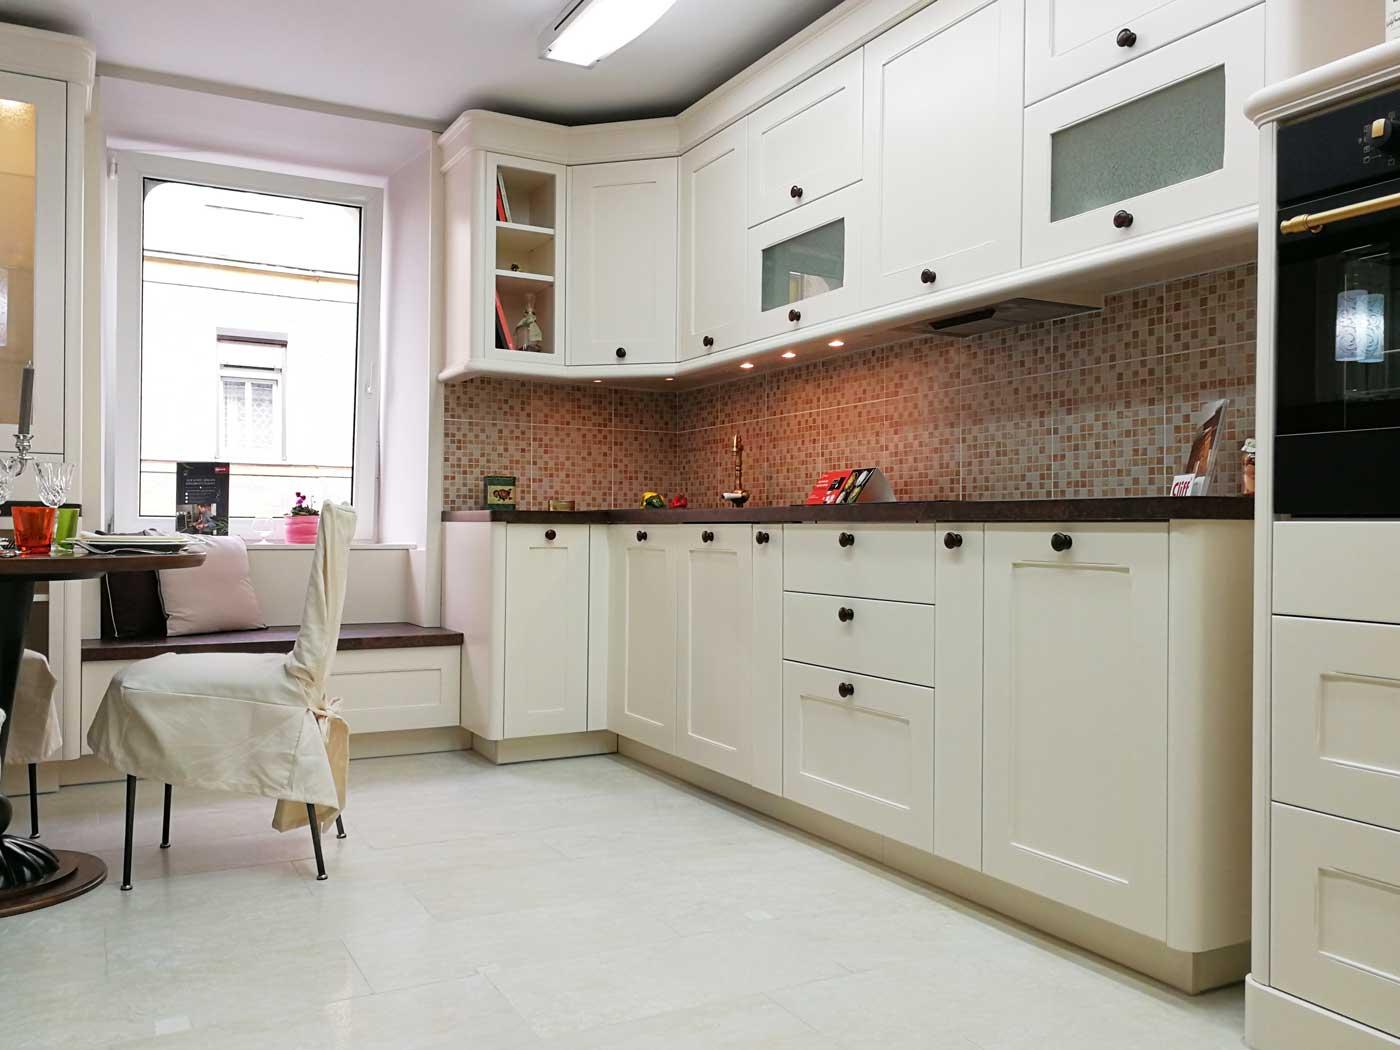 Egyedi konyha - fehér vintage konyha design - Cliff konyhabútor 1